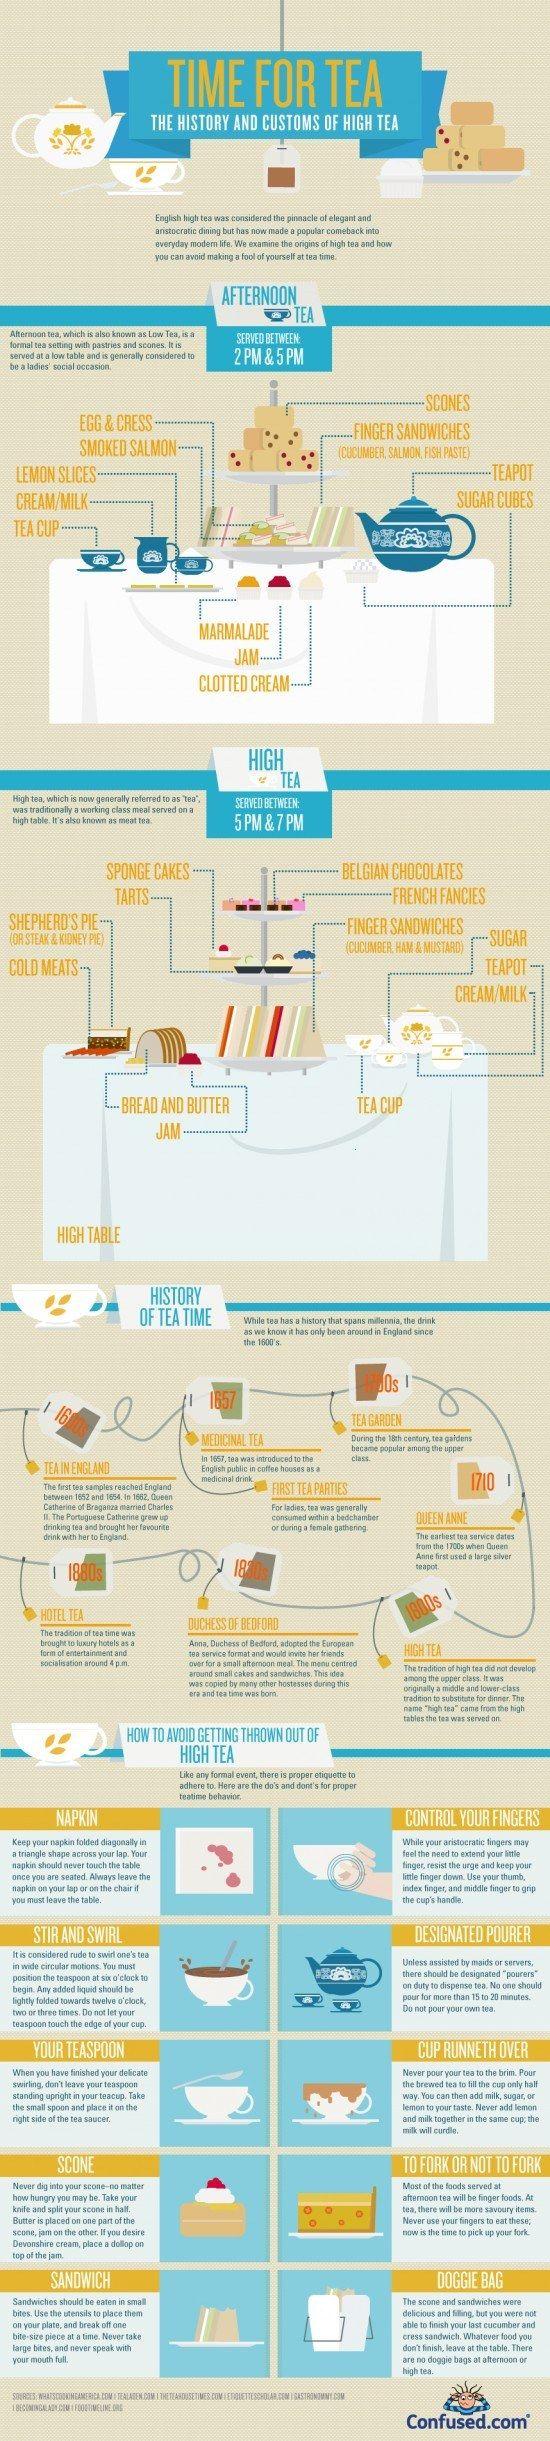 Party Planning - High Tea Etiquette & History